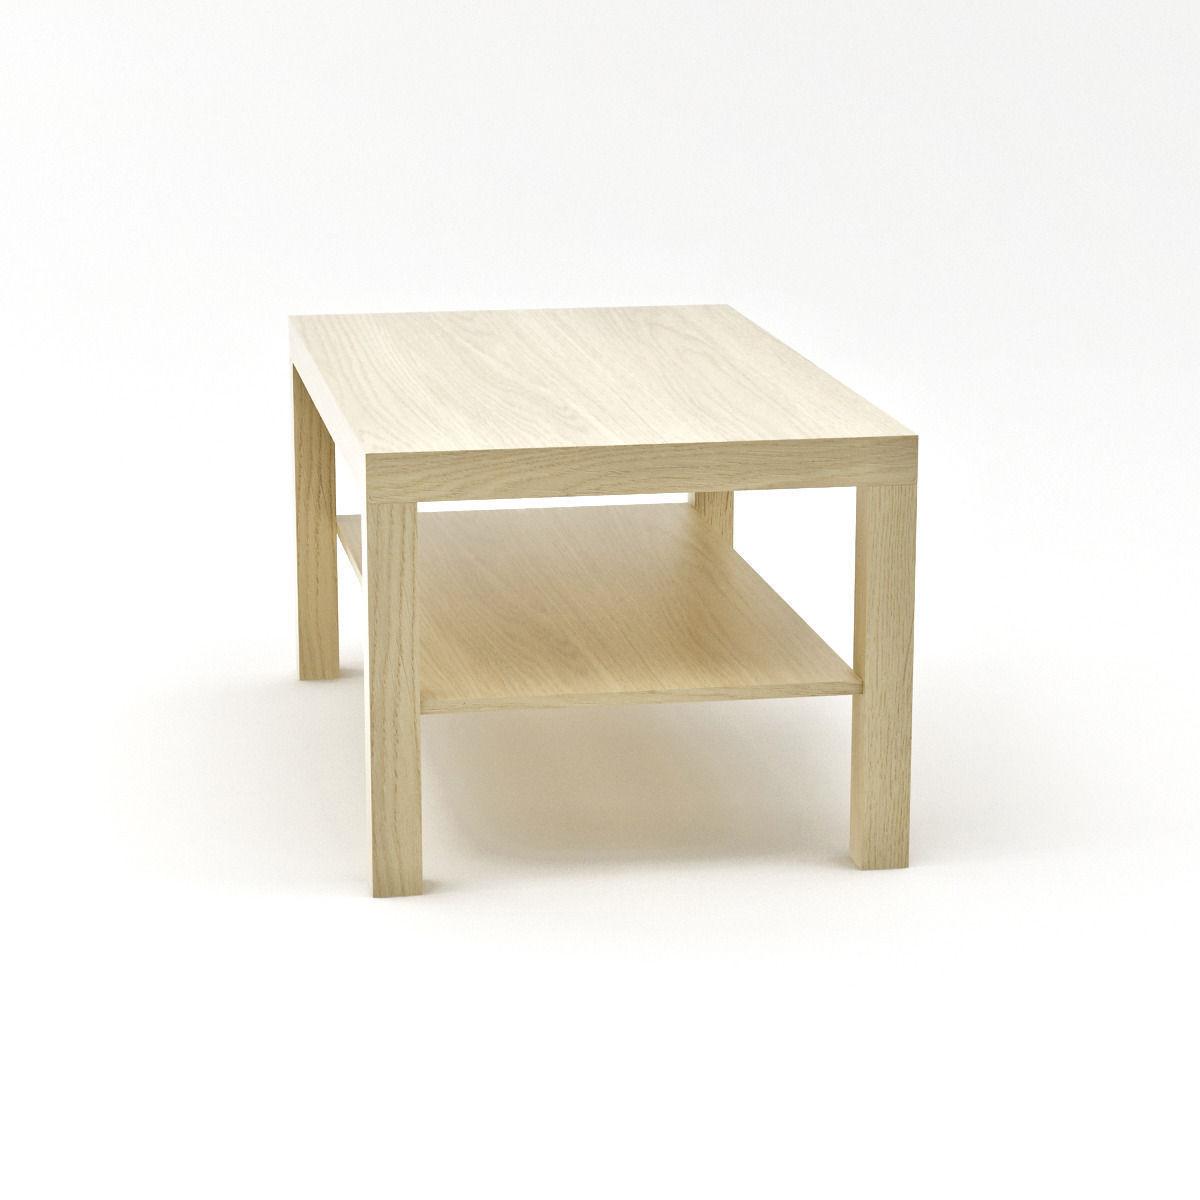 Ikea lack side table large 3d model max - Ikea table lack ...